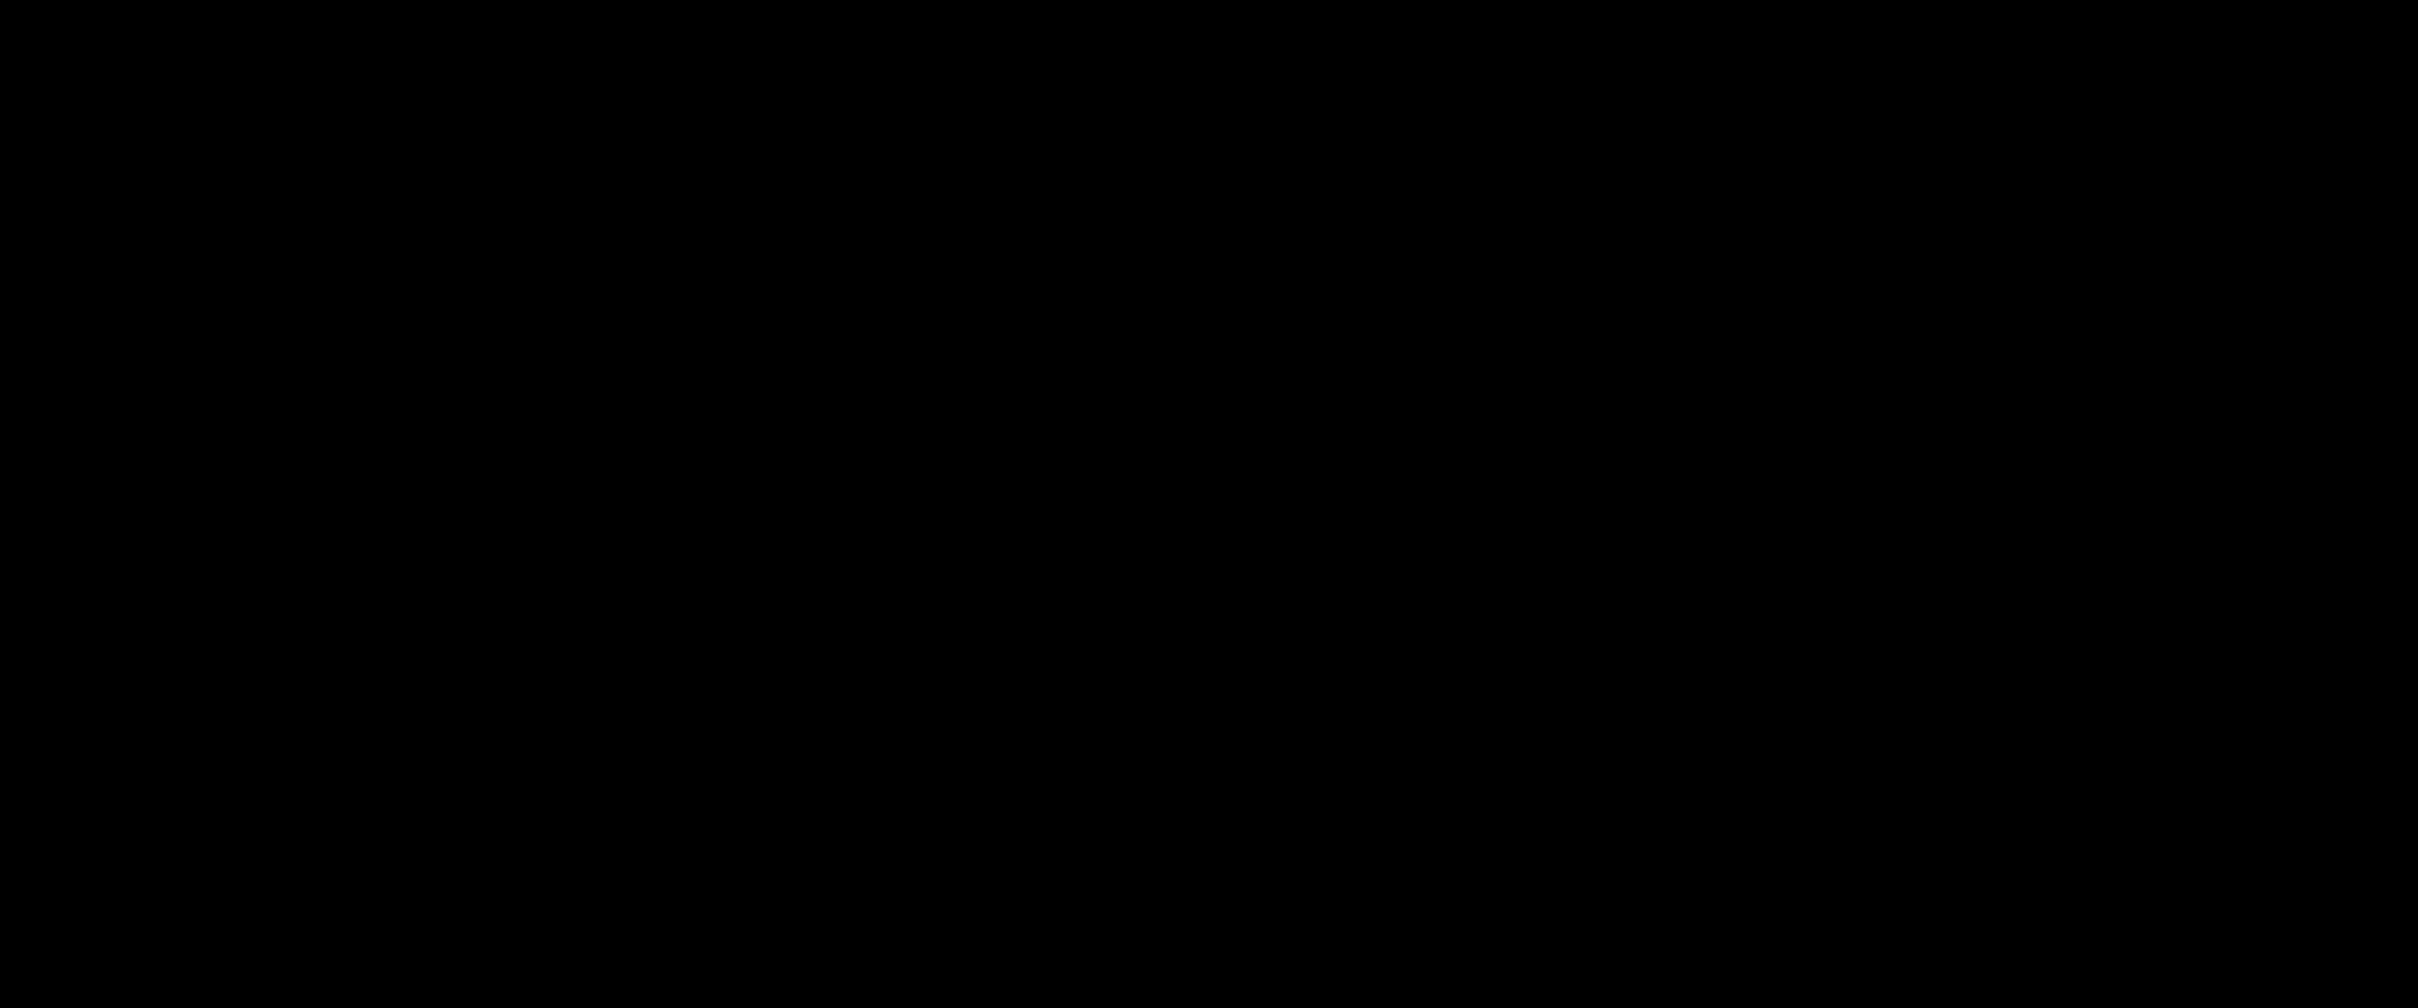 bbc logo 01